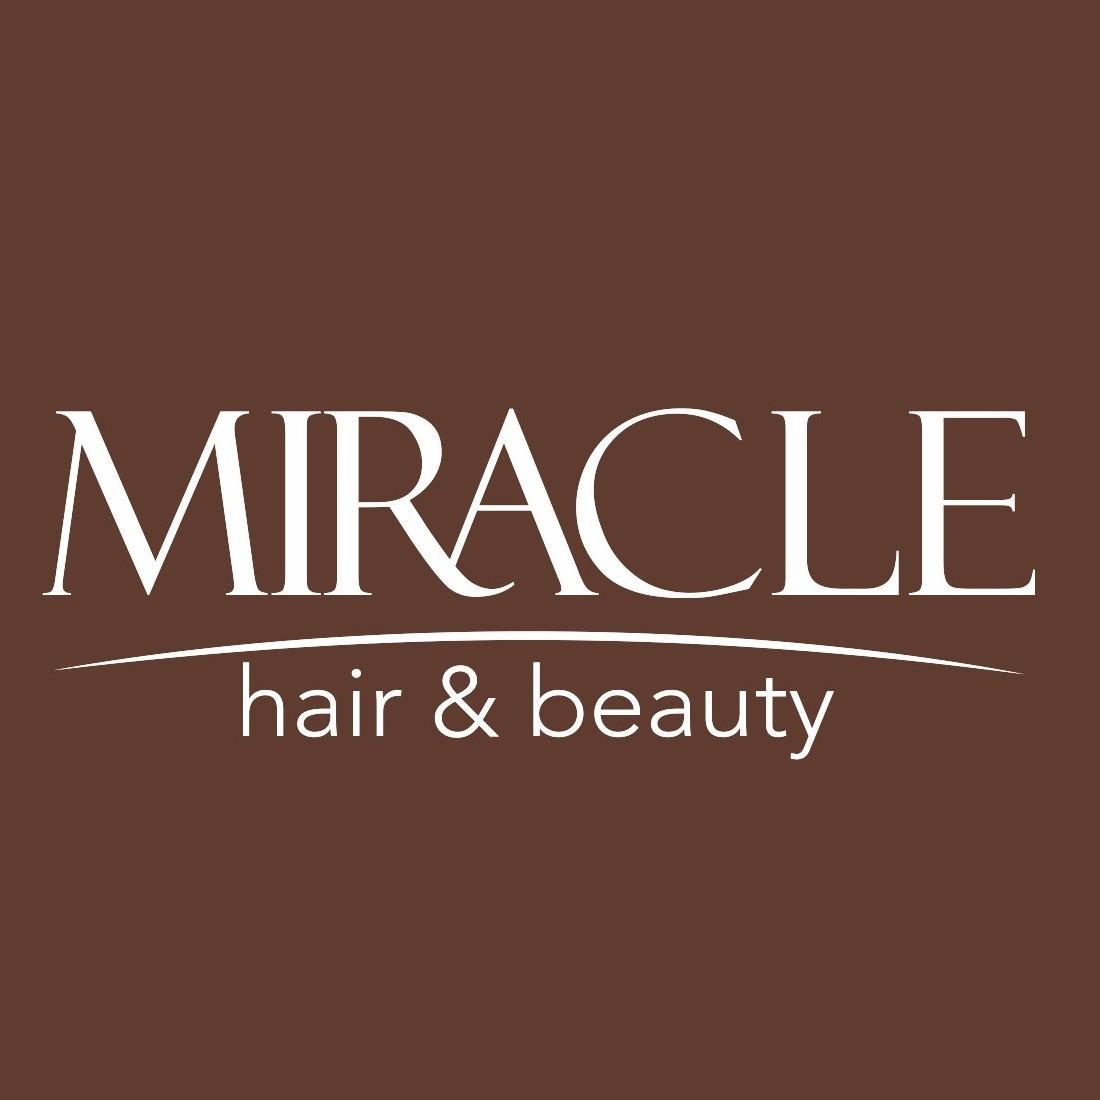 Miracle. Hair & Beauty